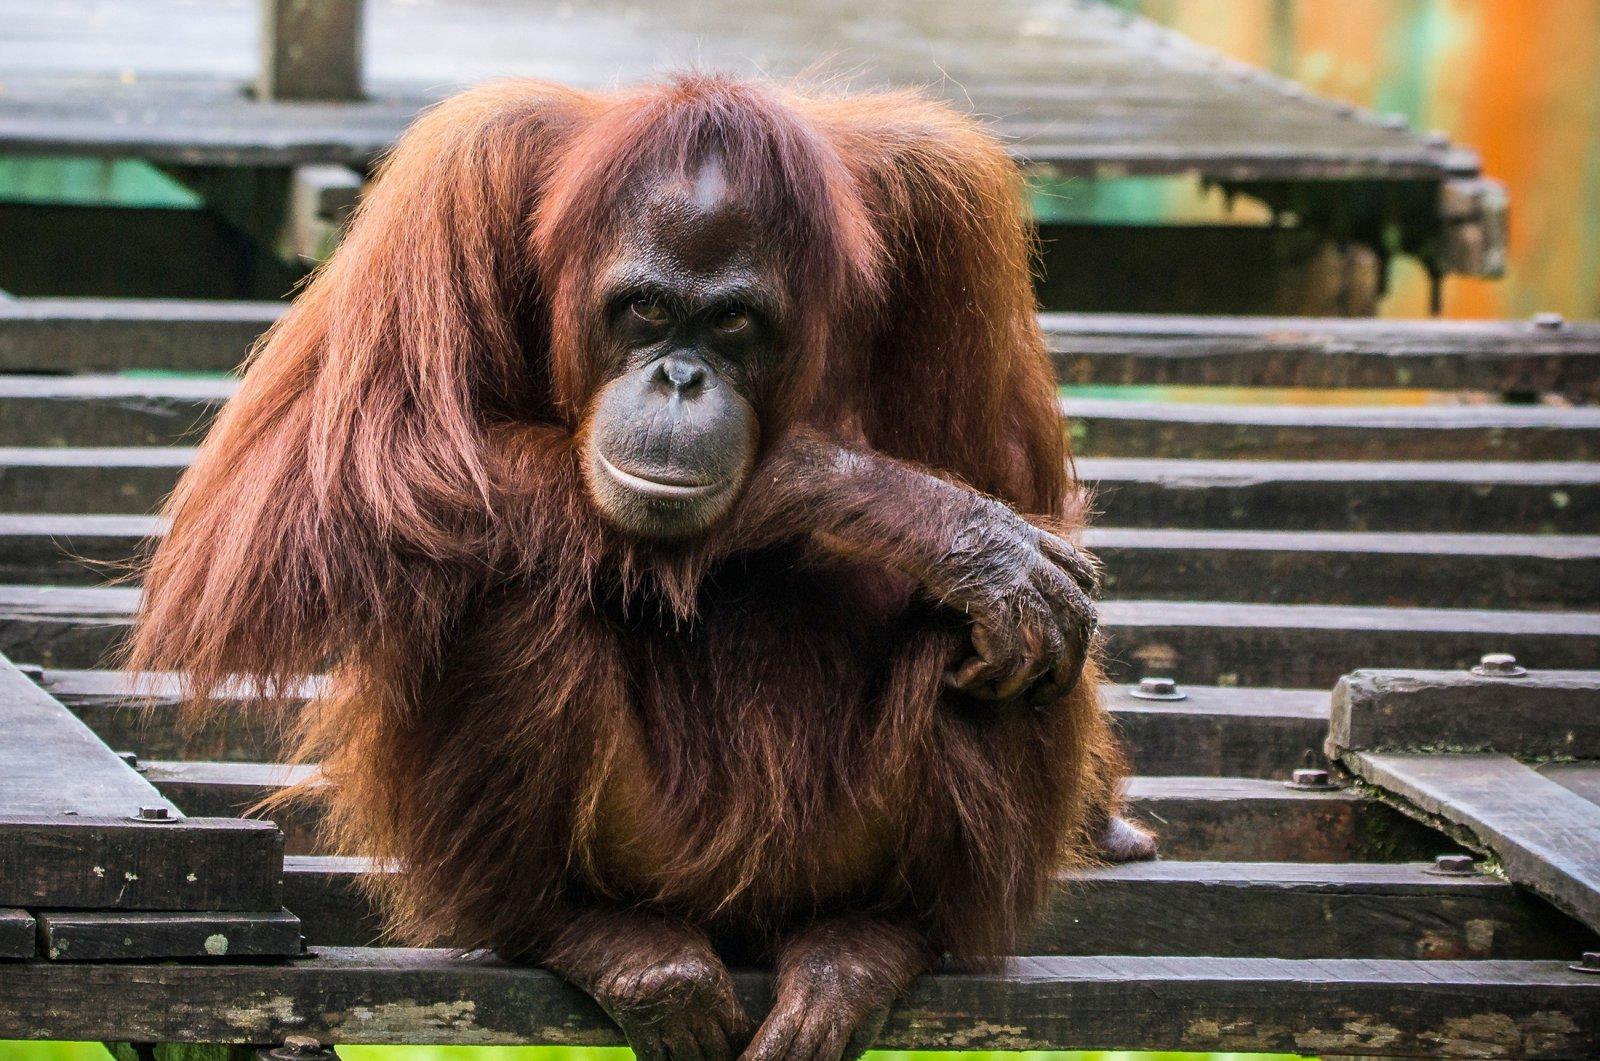 An orangutan rests on a step, in Sabah, Malaysia. (Shutterstock Photo)